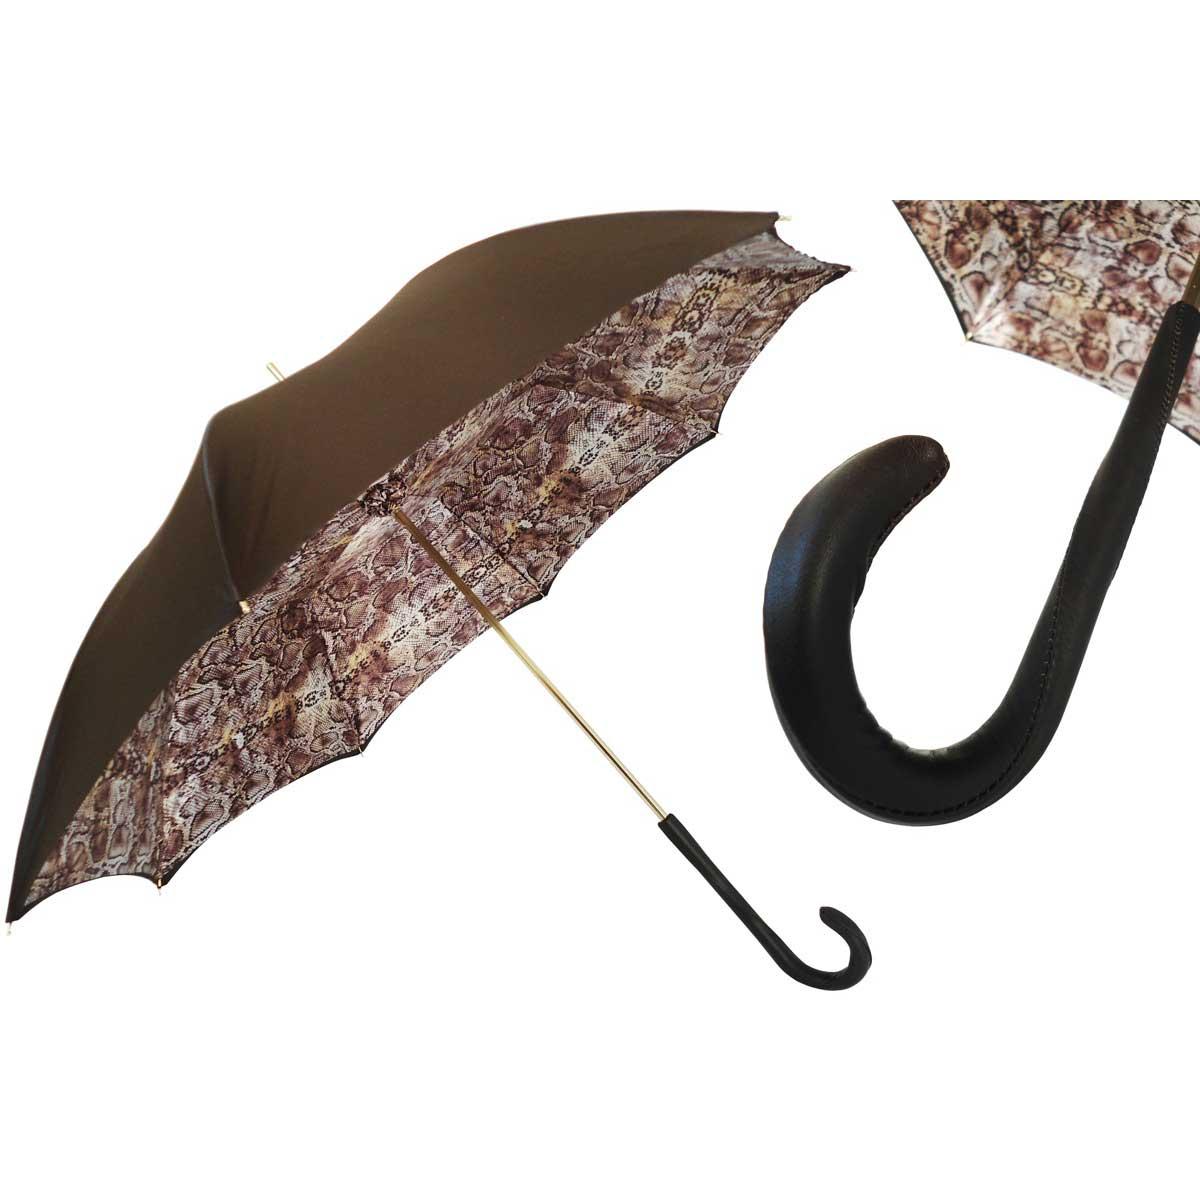 b493987a97d4 Pasotti Burnished Green Python Print Animalier Women's Umbrella